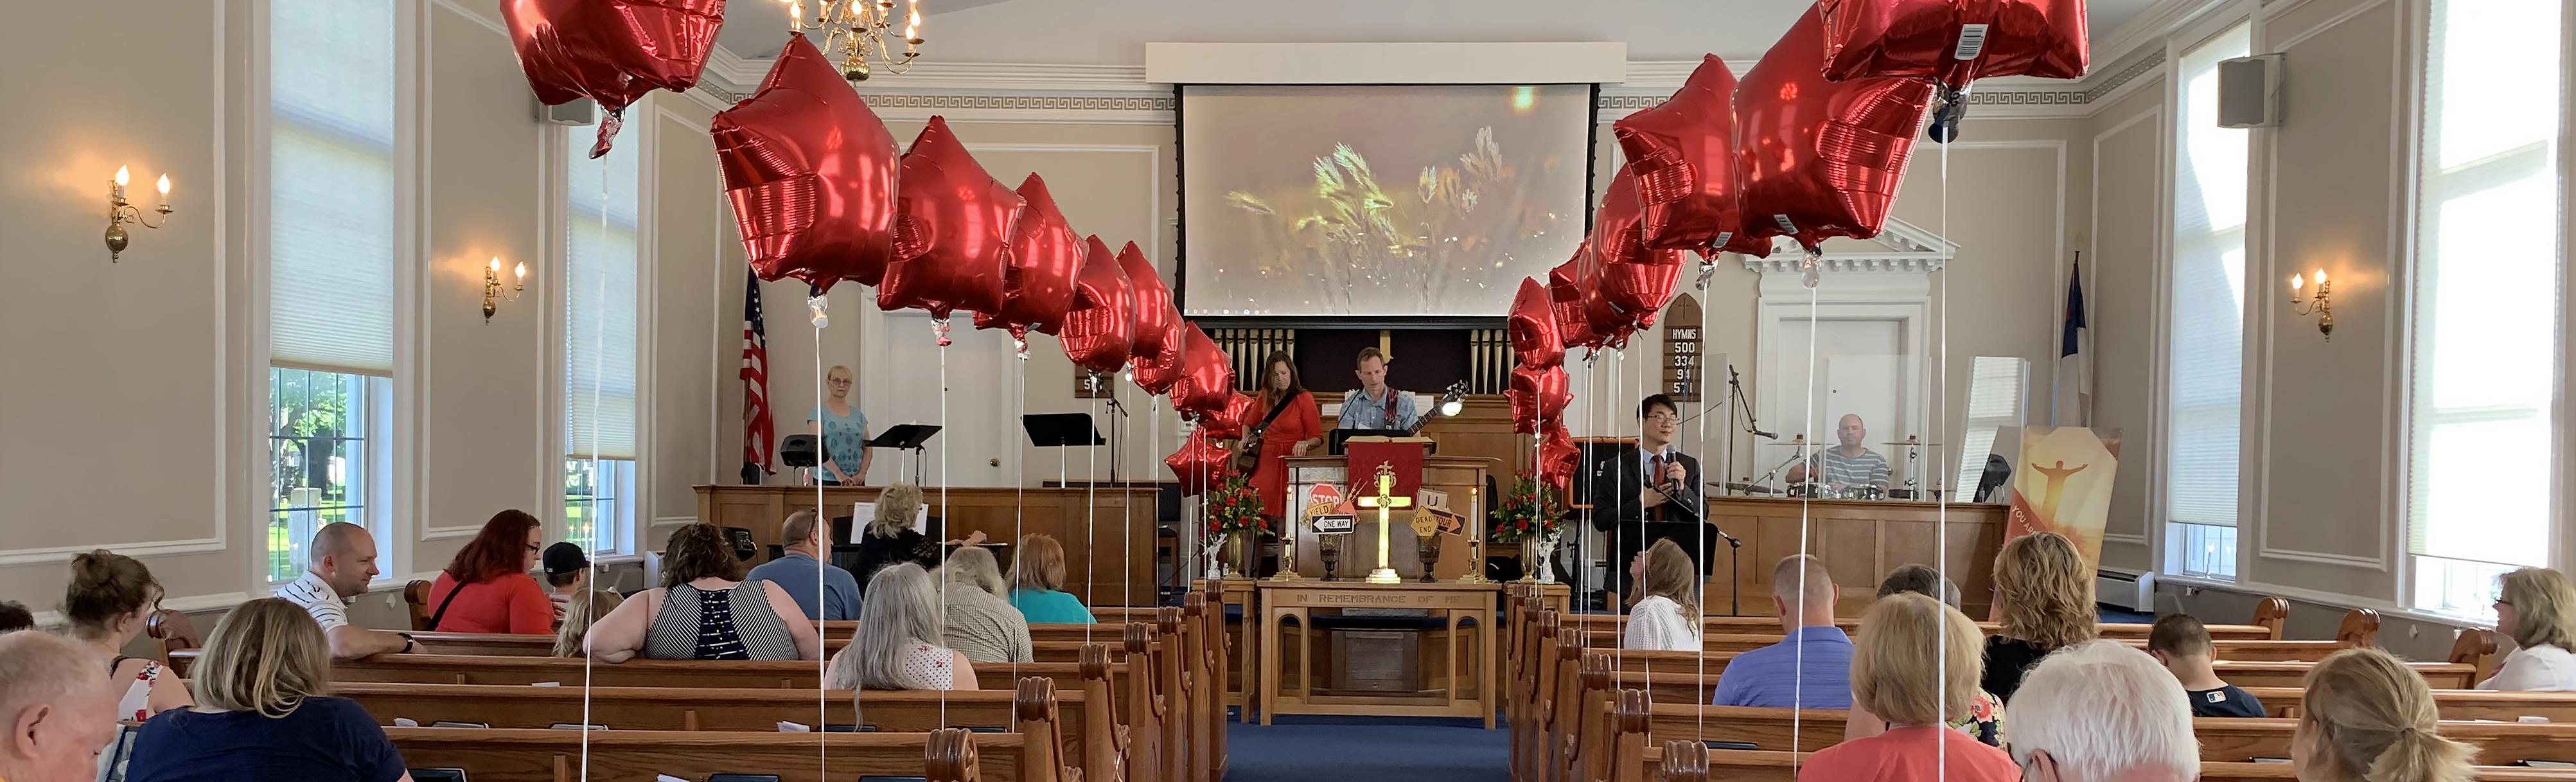 Chapel_Pentecost_2019Banner_IMG_5935